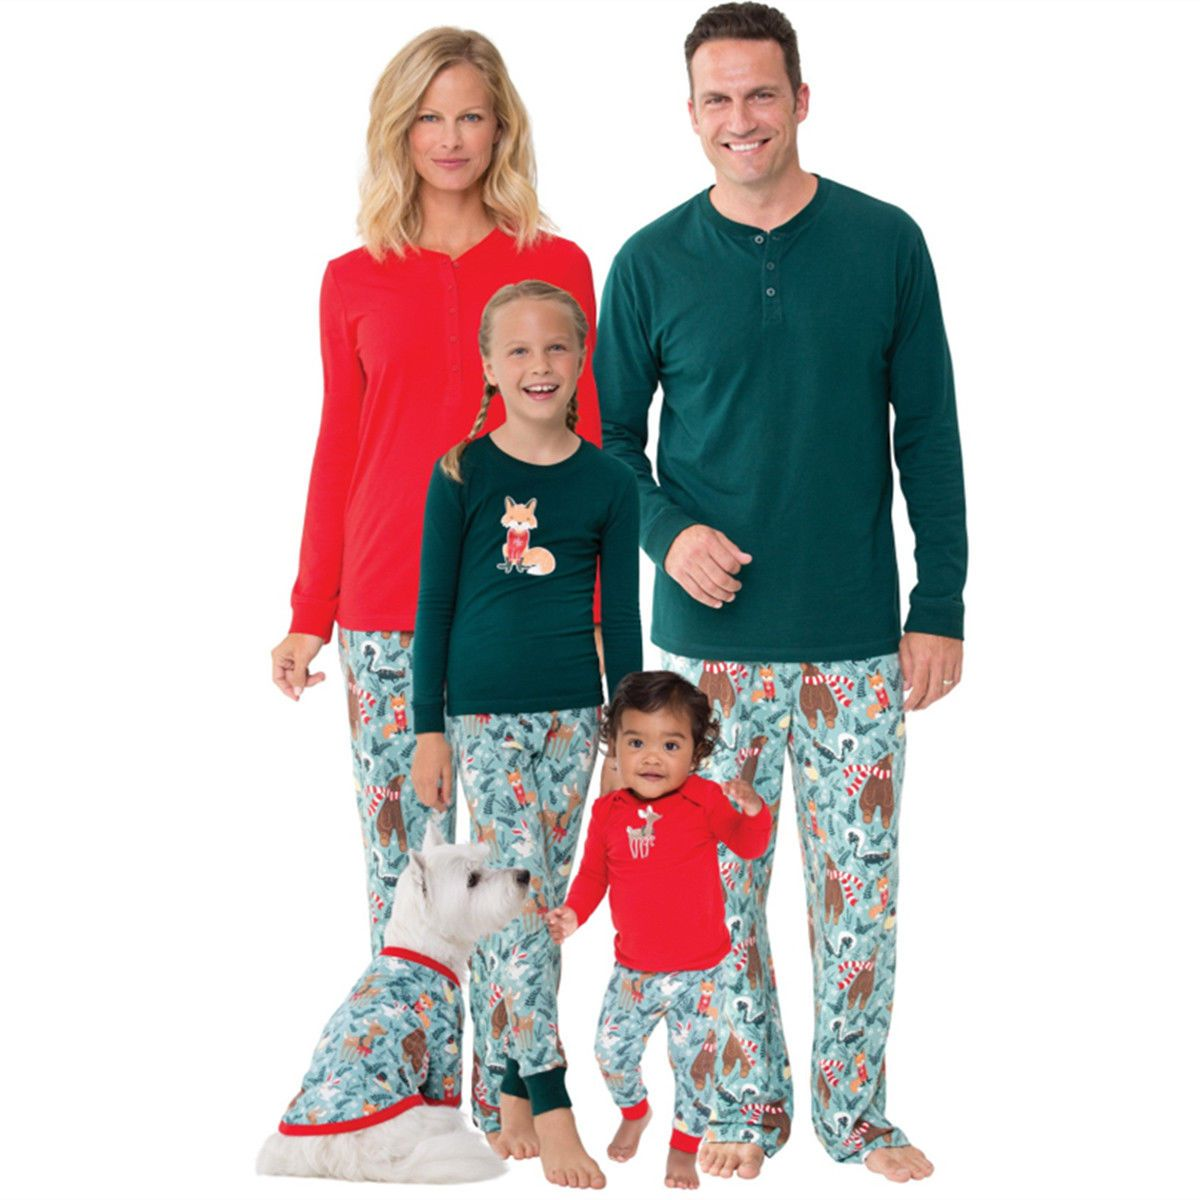 ad3d3319fd  9.99 - Us Family Matching Christmas Pajamas Set Women Men Kids Sleepwear  Nightwear Hot  ebay  Fashion